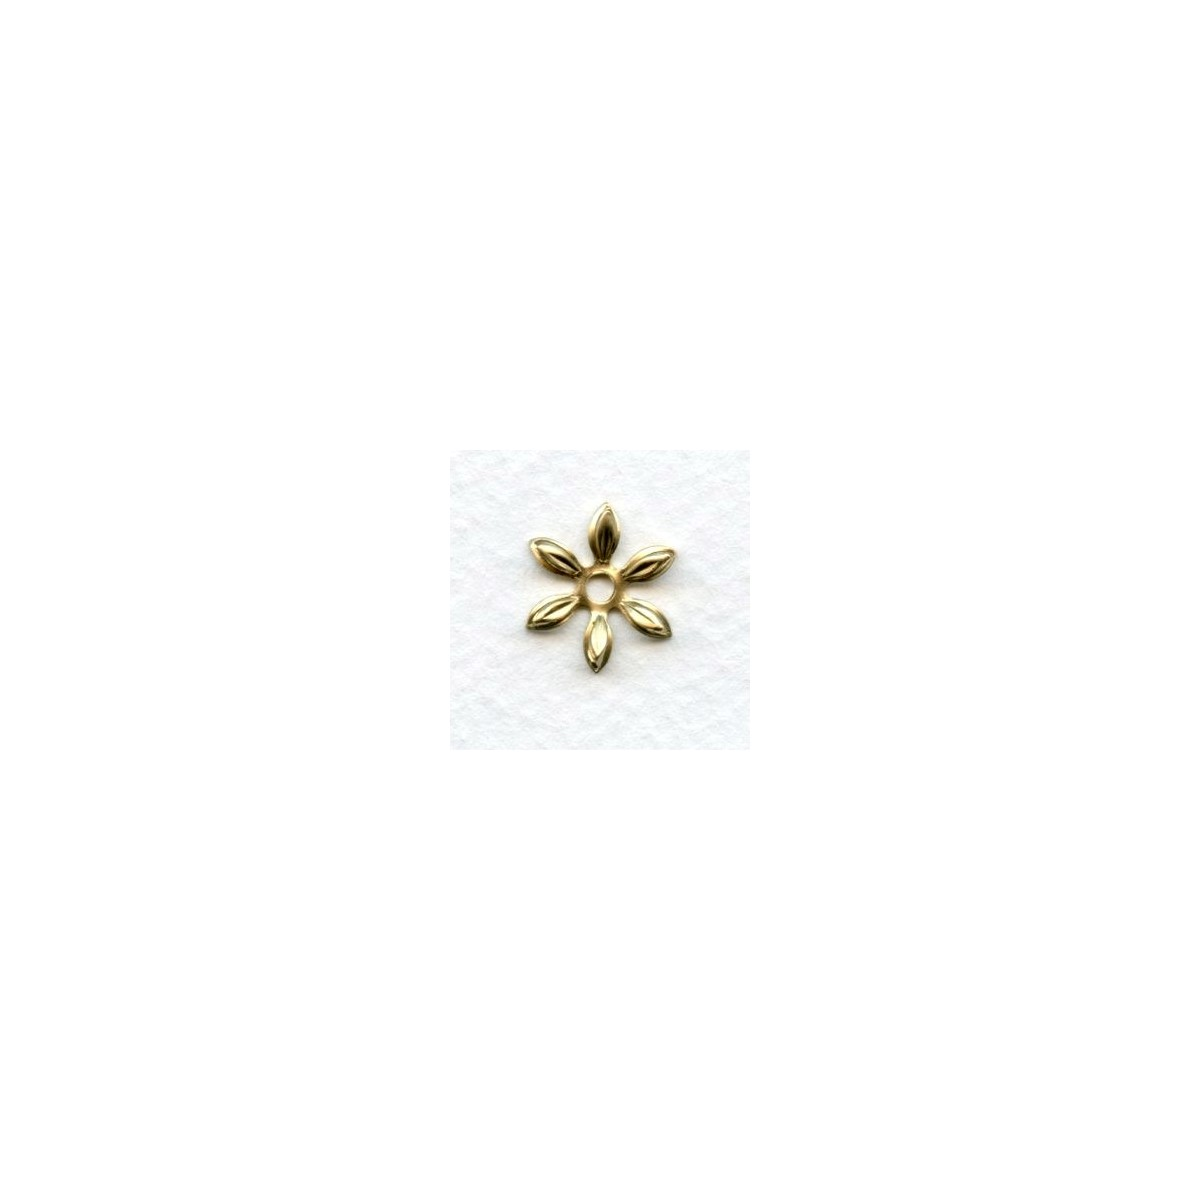 Cut Out Detail Petals Flower Bead Caps Oxidized Brass (12)